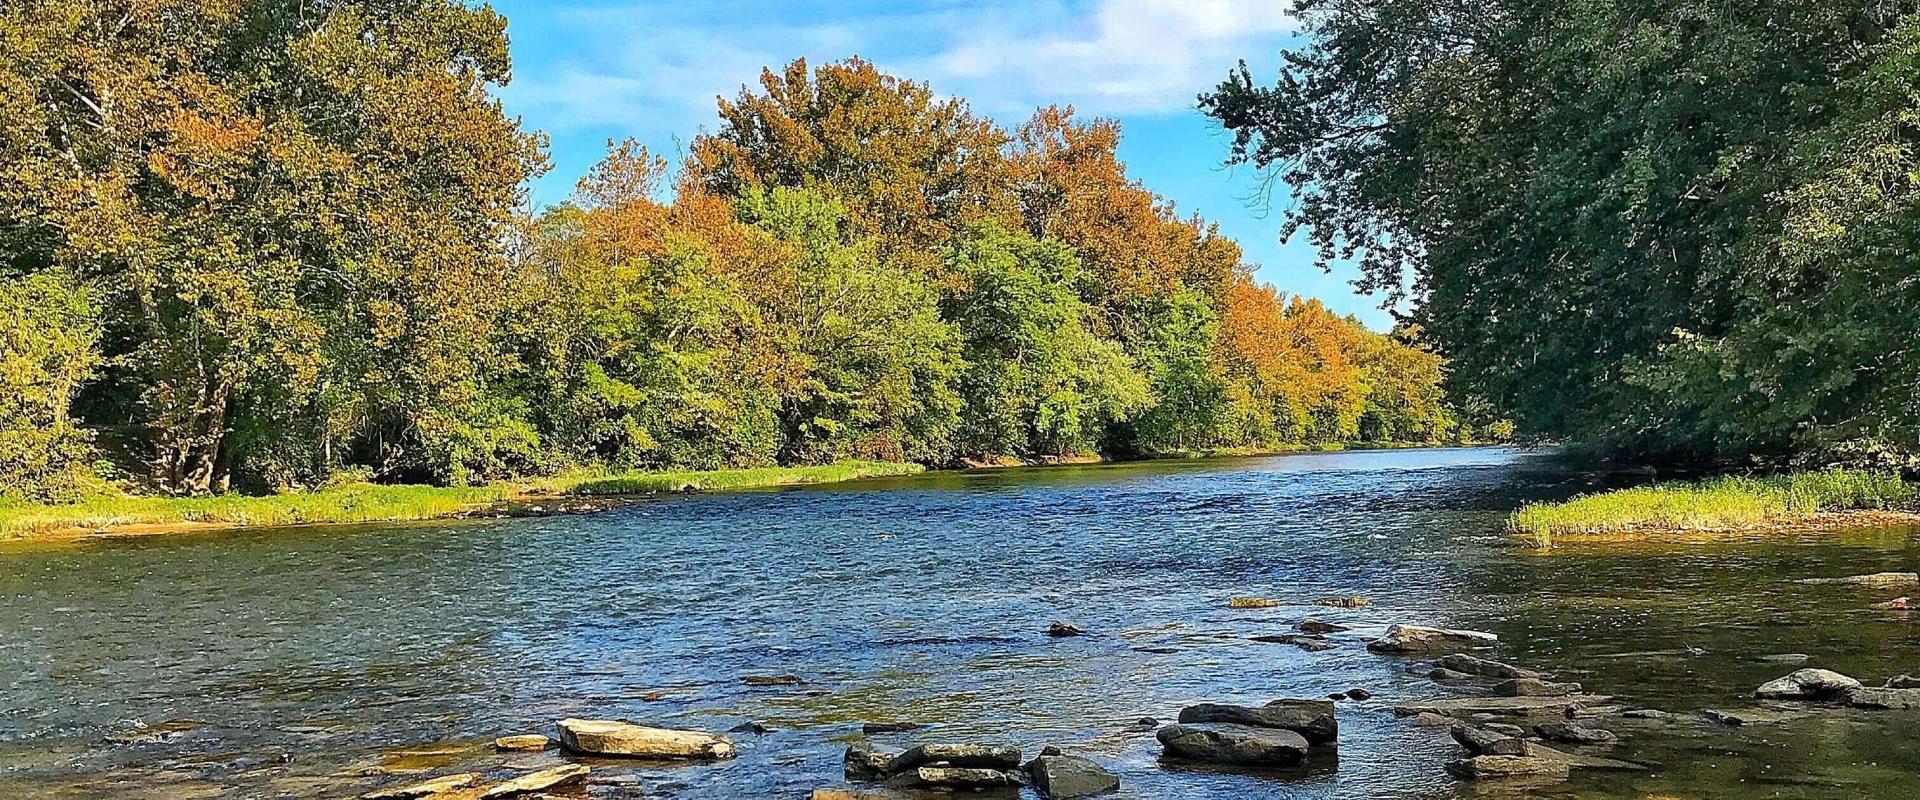 Ohio River Tributaries Riparian Habitat Restoration